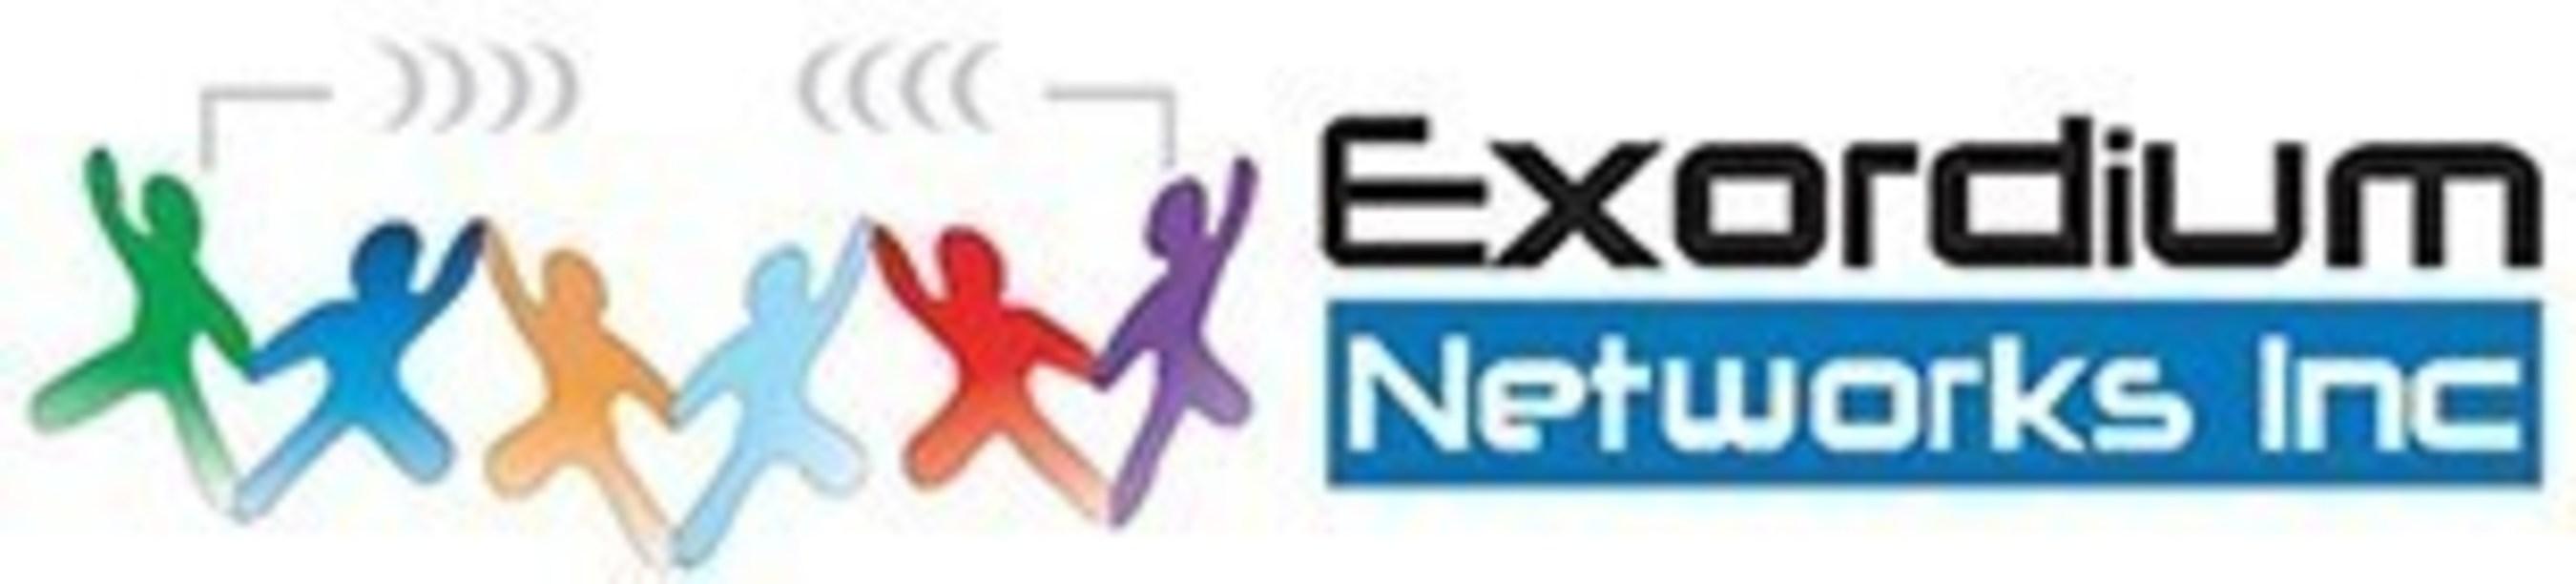 Exordium Networks, Inc., Celebrates 15th Anniversary and New Website Design